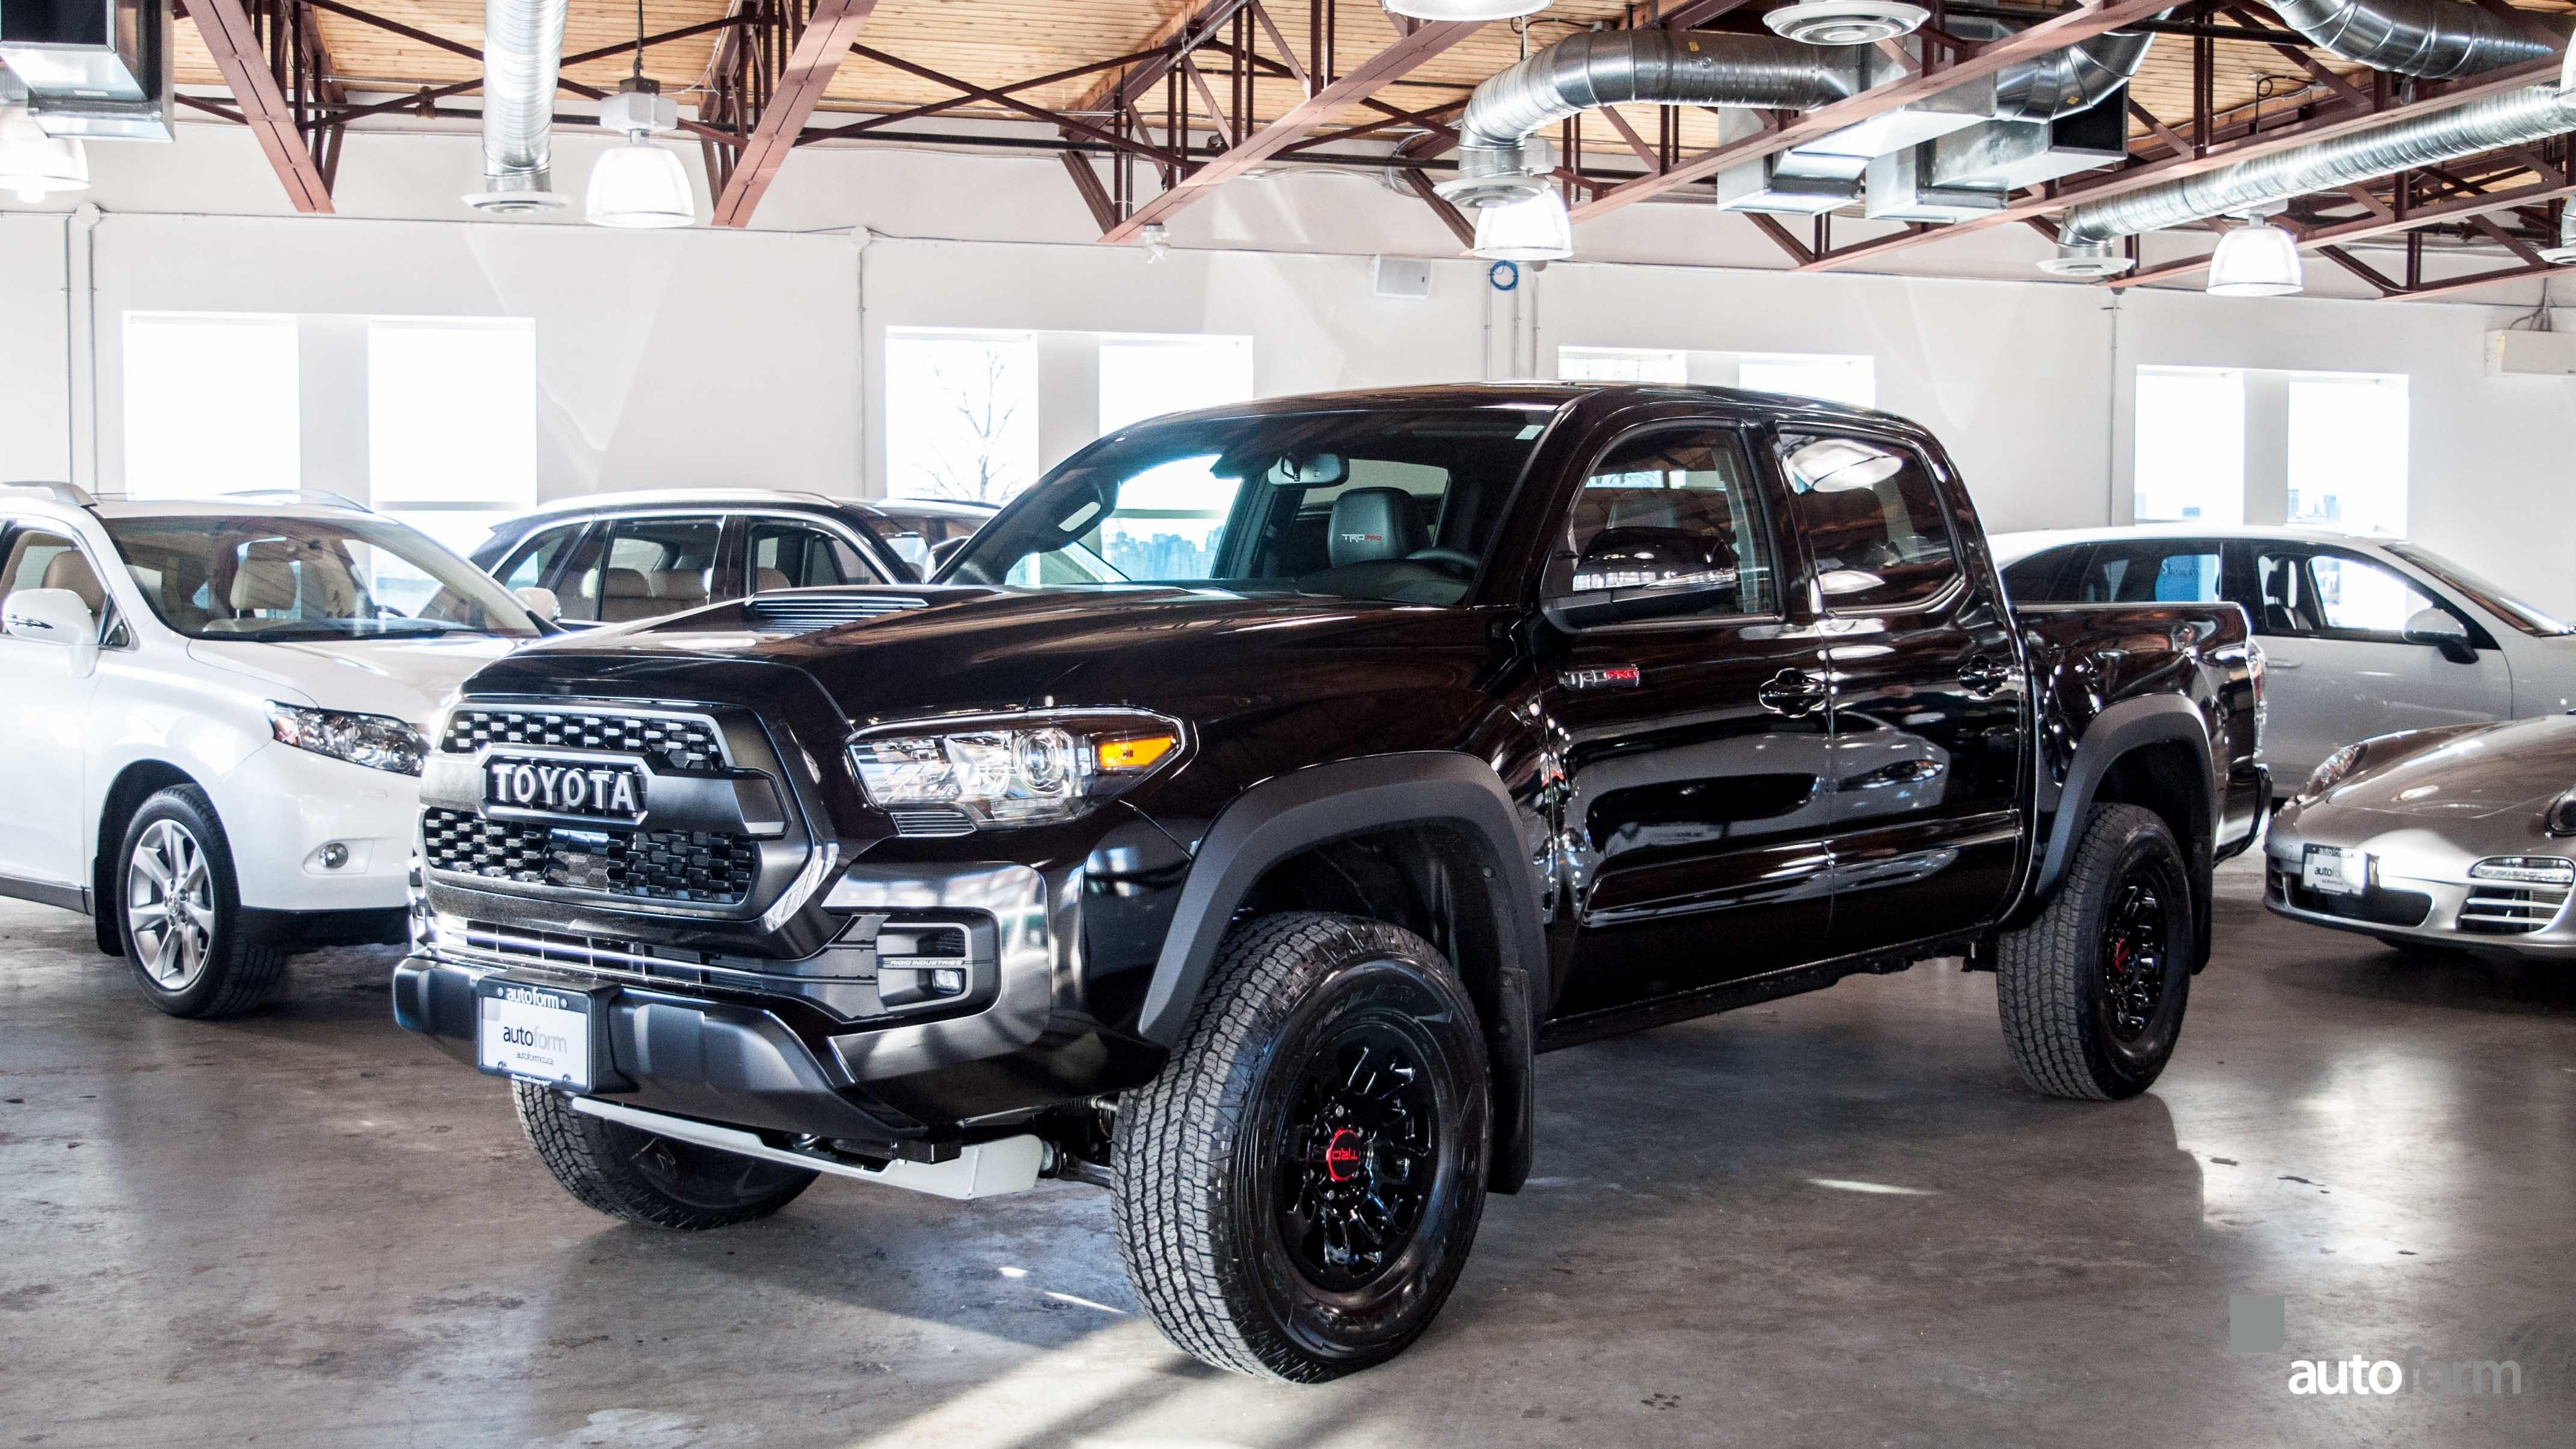 2018 Toyota Tacoma Trd Pro Autoform